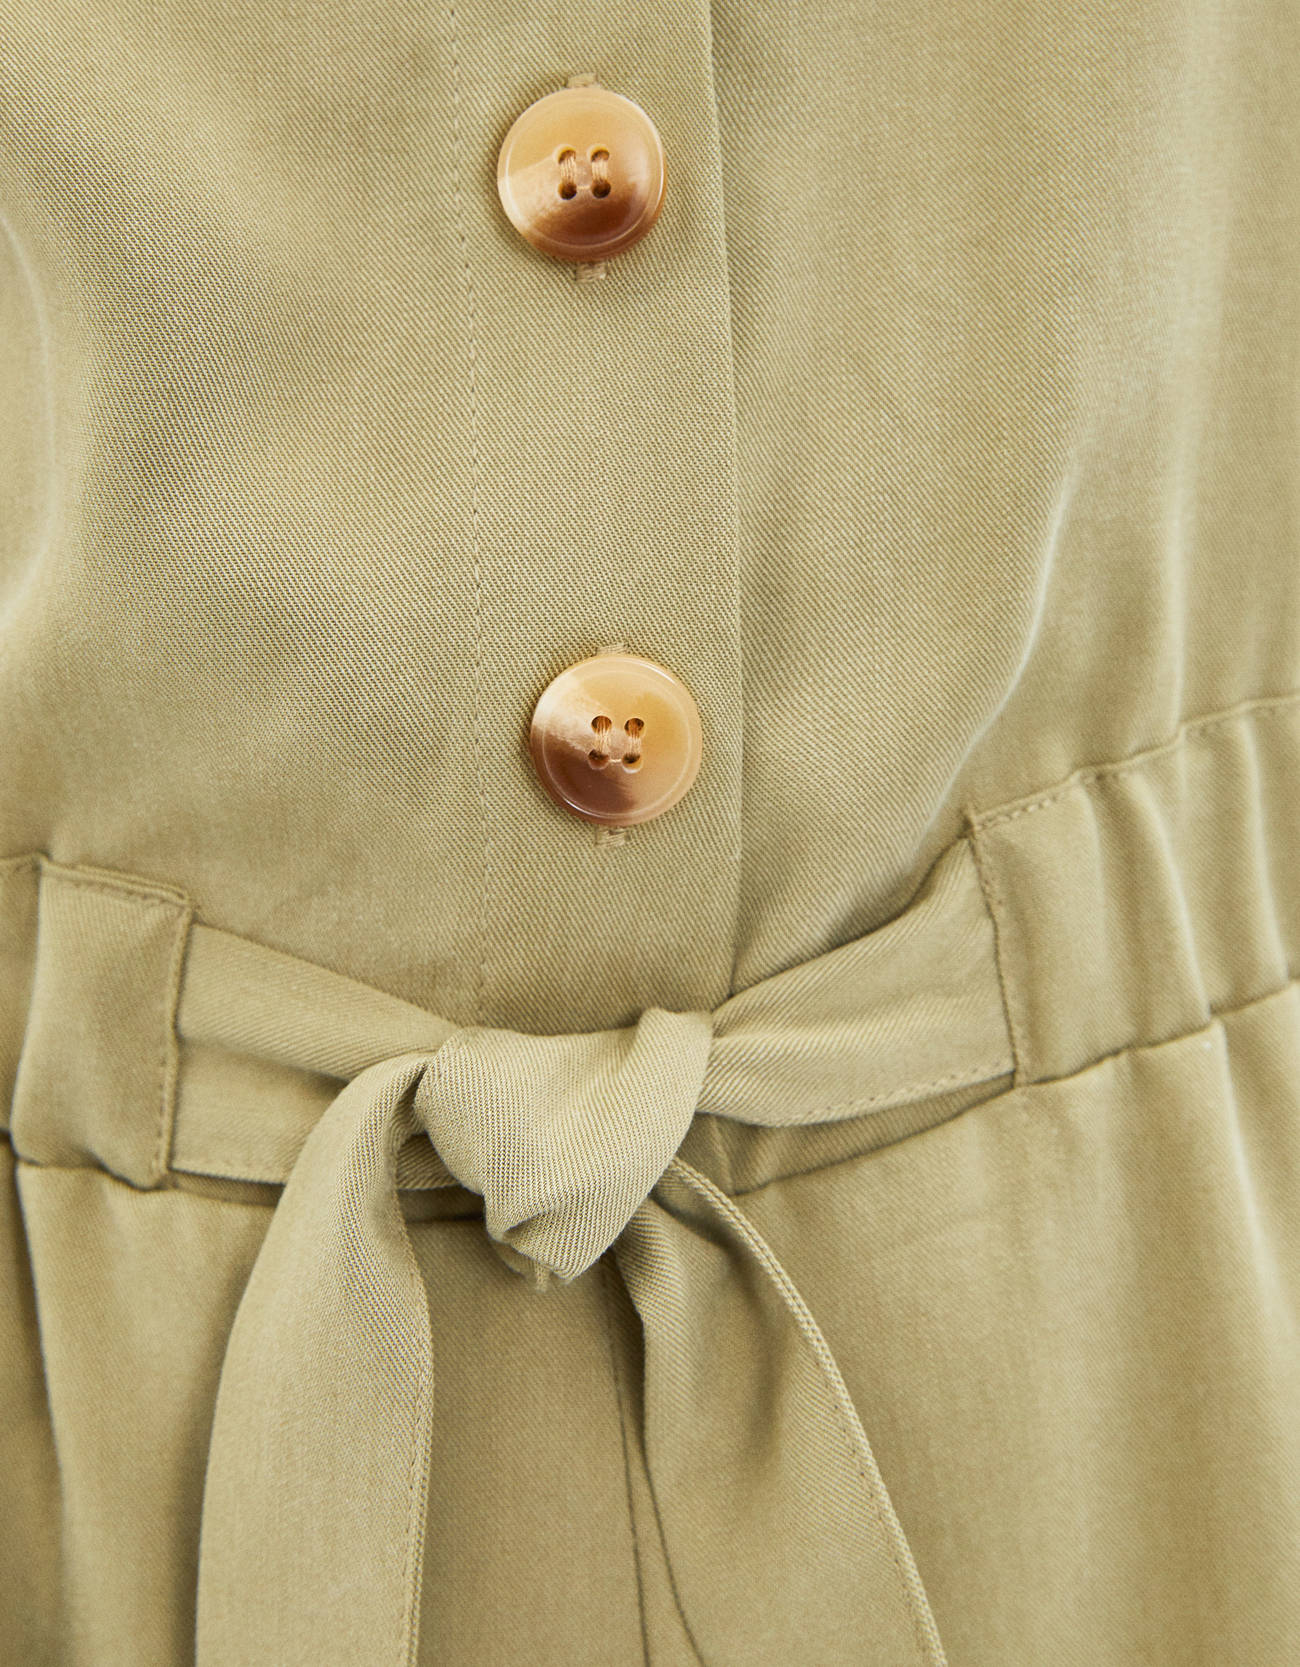 Короткий комбинезон из ткани ТЕНСЕЛ® с завязками Хаки Bershka